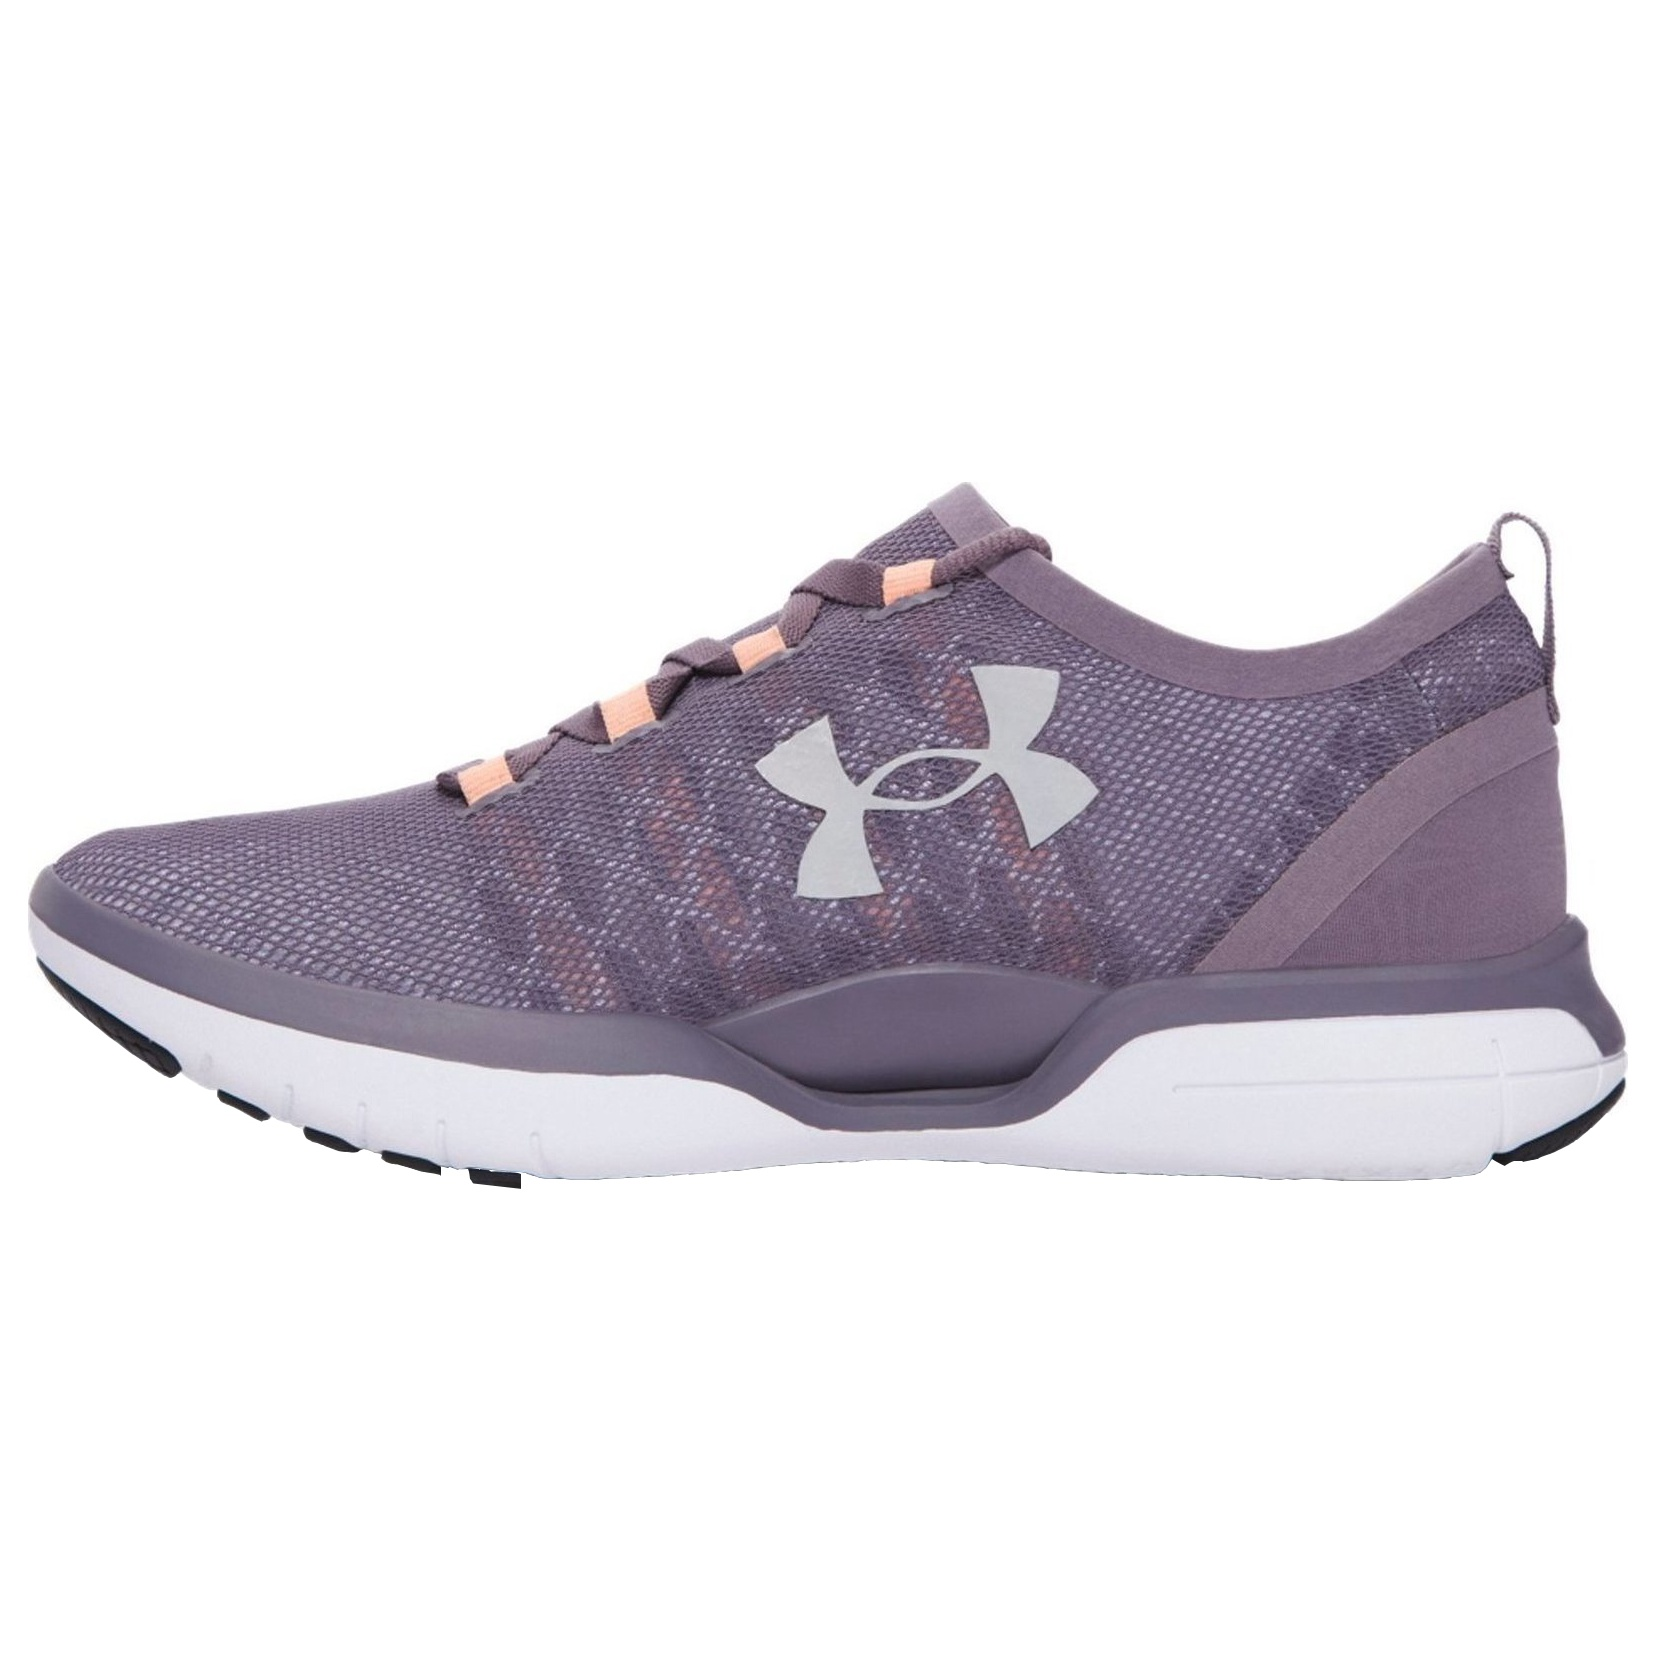 کفش مخصوص دویدن زنانه آندر آرمور مدل Charged CoolSwitch